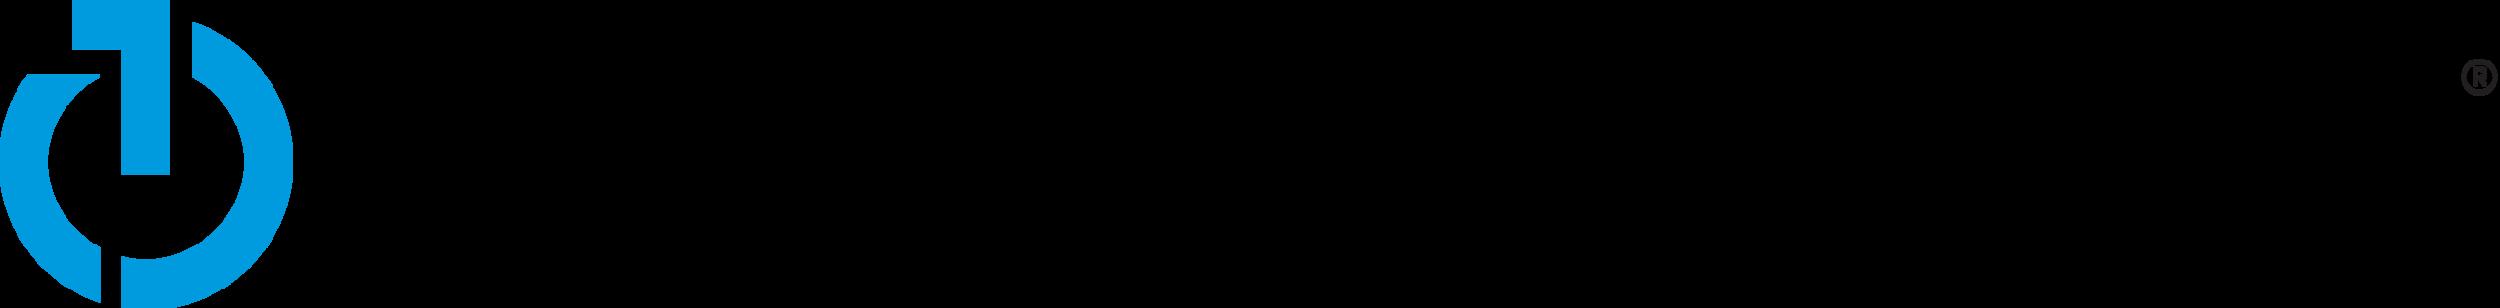 TheTradeDesk-Logo-RGB_R.png